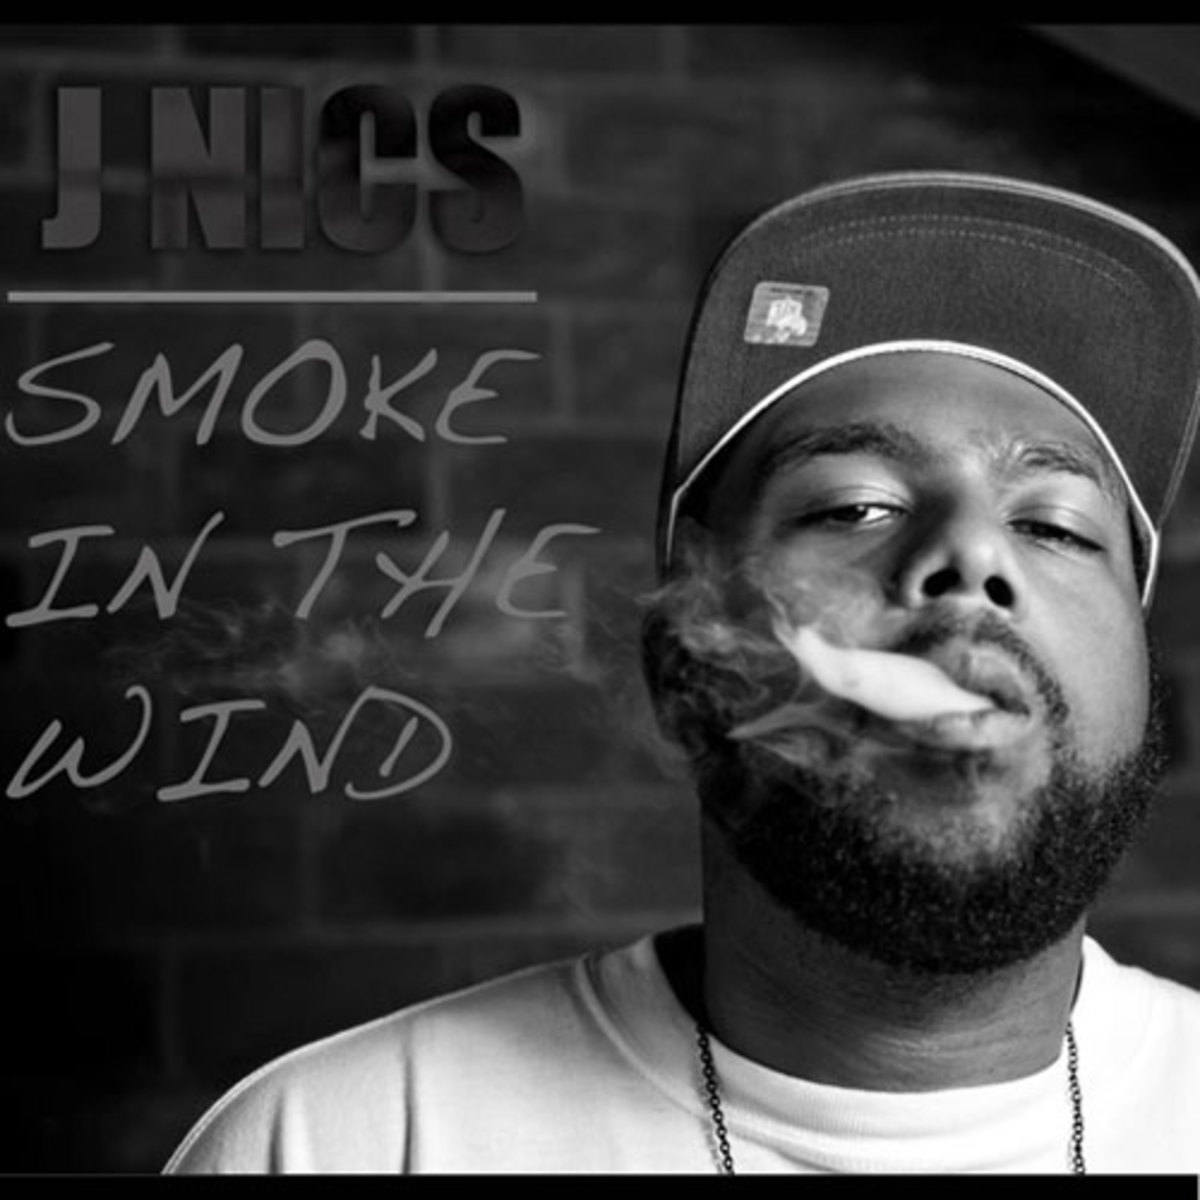 jnics-smokewind.jpg